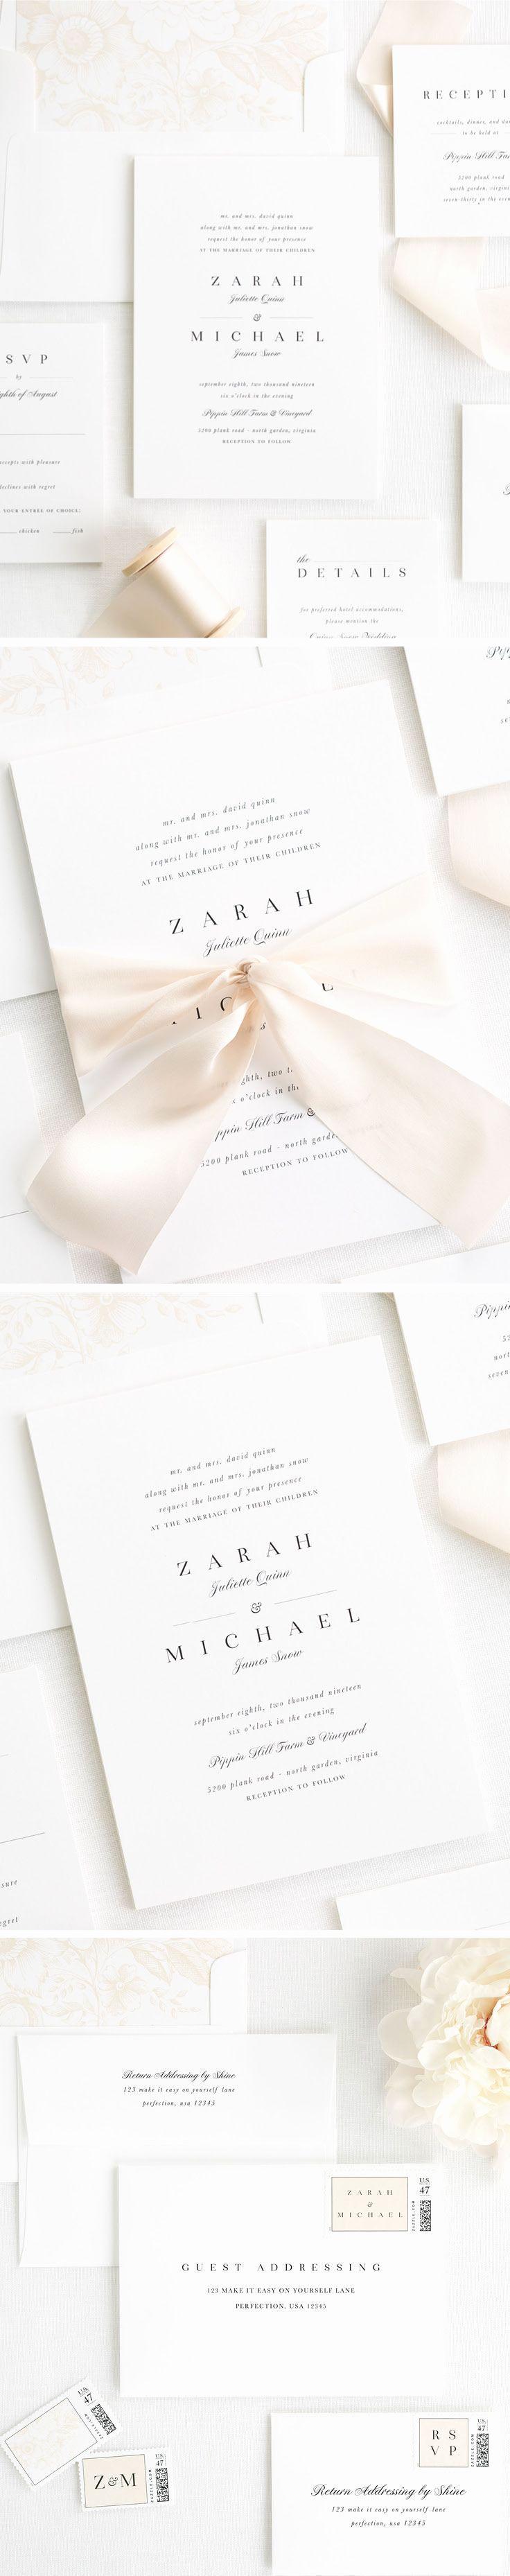 Unique Wedding Invitation Ideas Inspirational Best 25 Unique Wedding Invitations Ideas On Pinterest